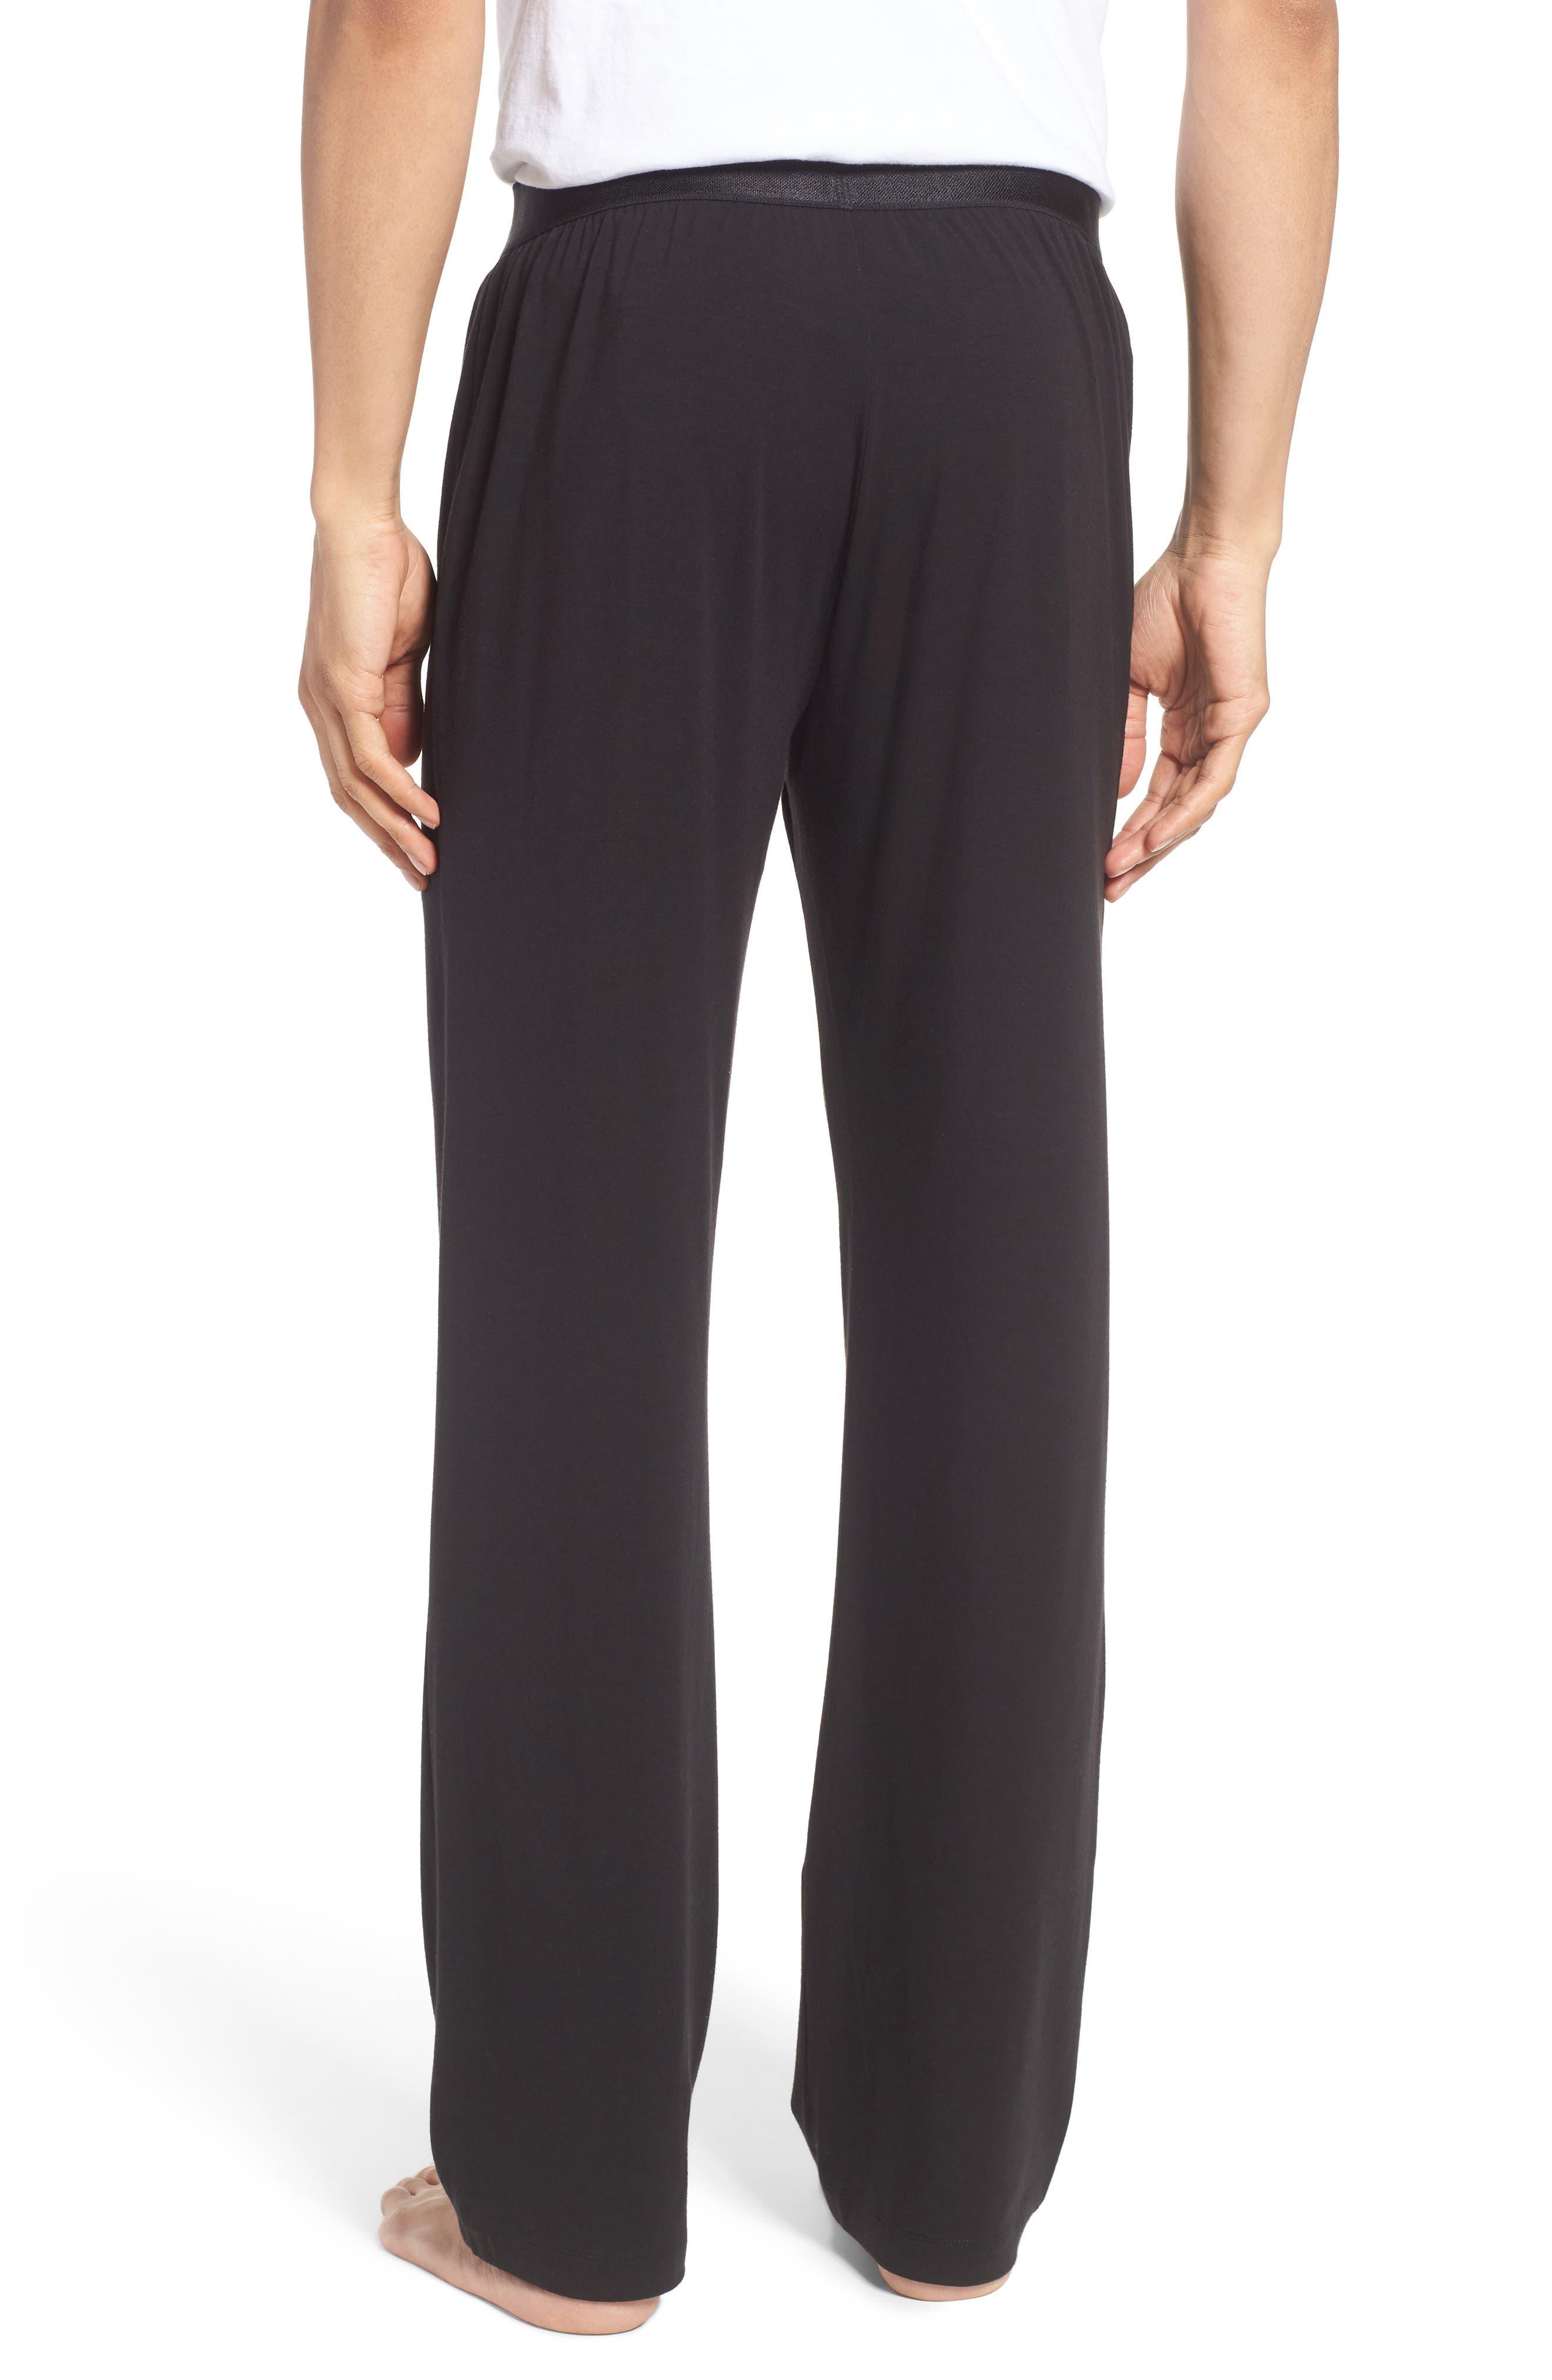 Micromodal Blend Lounge Pants,                             Alternate thumbnail 2, color,                             Black